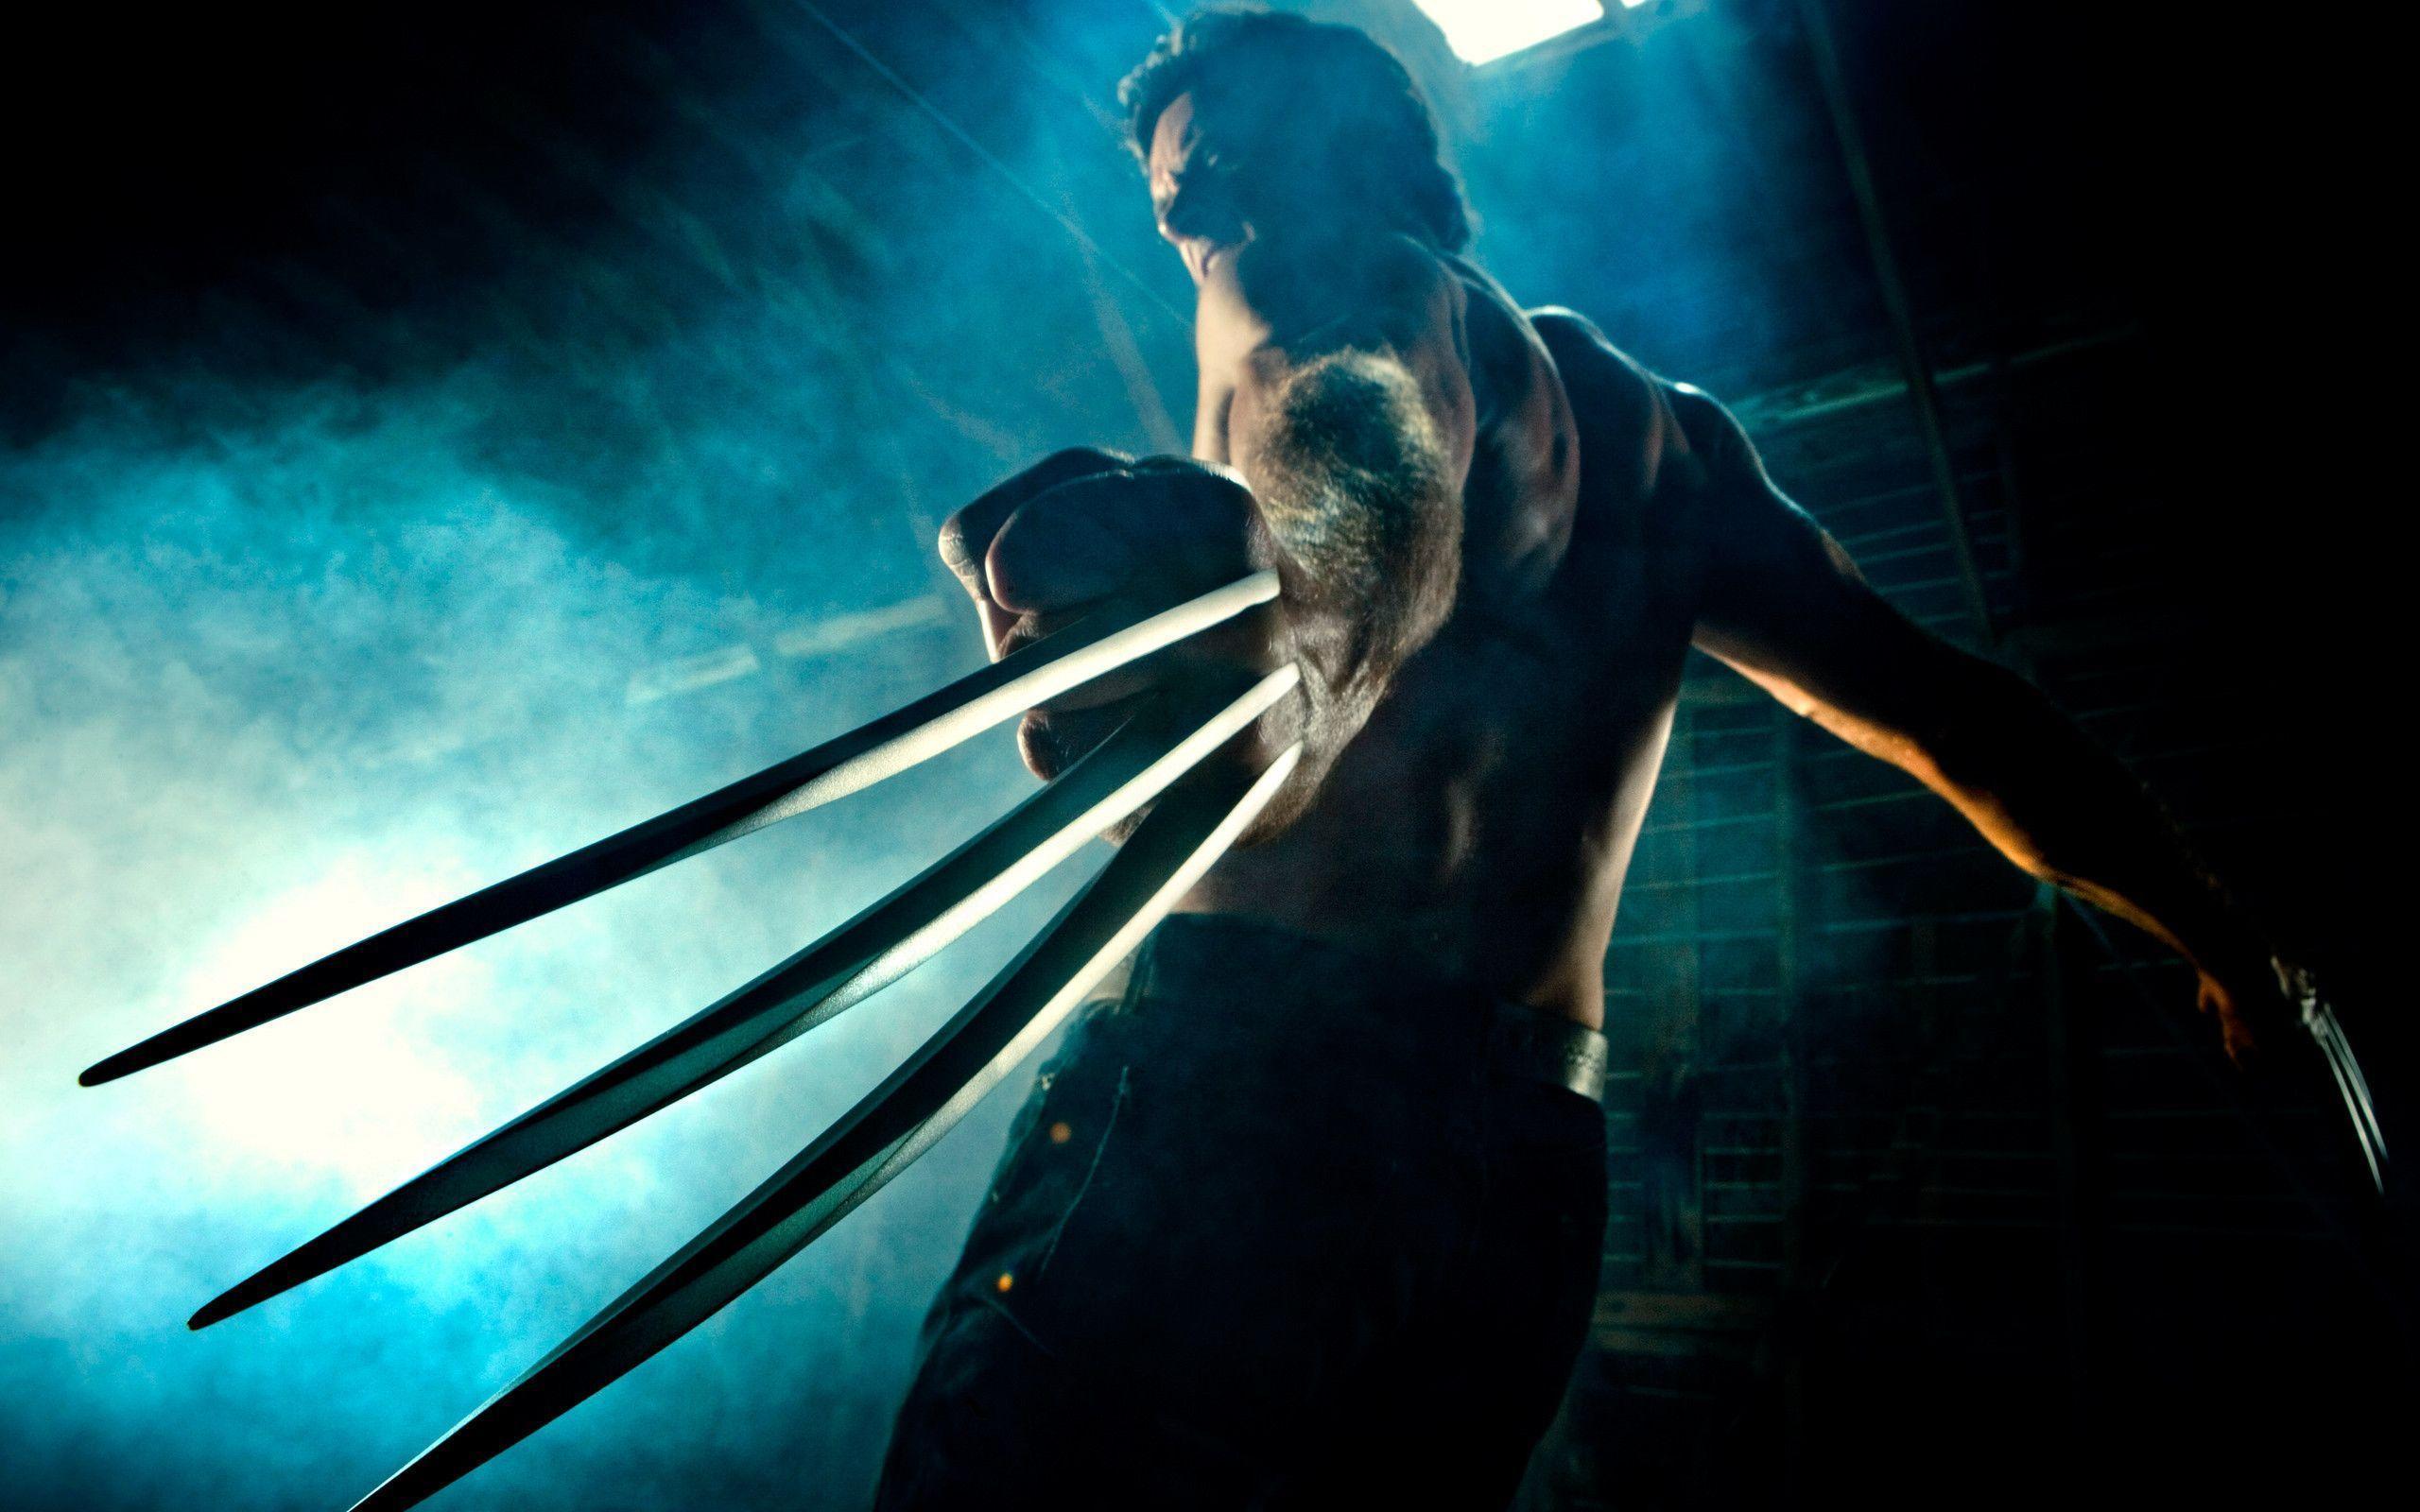 Wolverine Wallpaper - Full HD wallpaper search